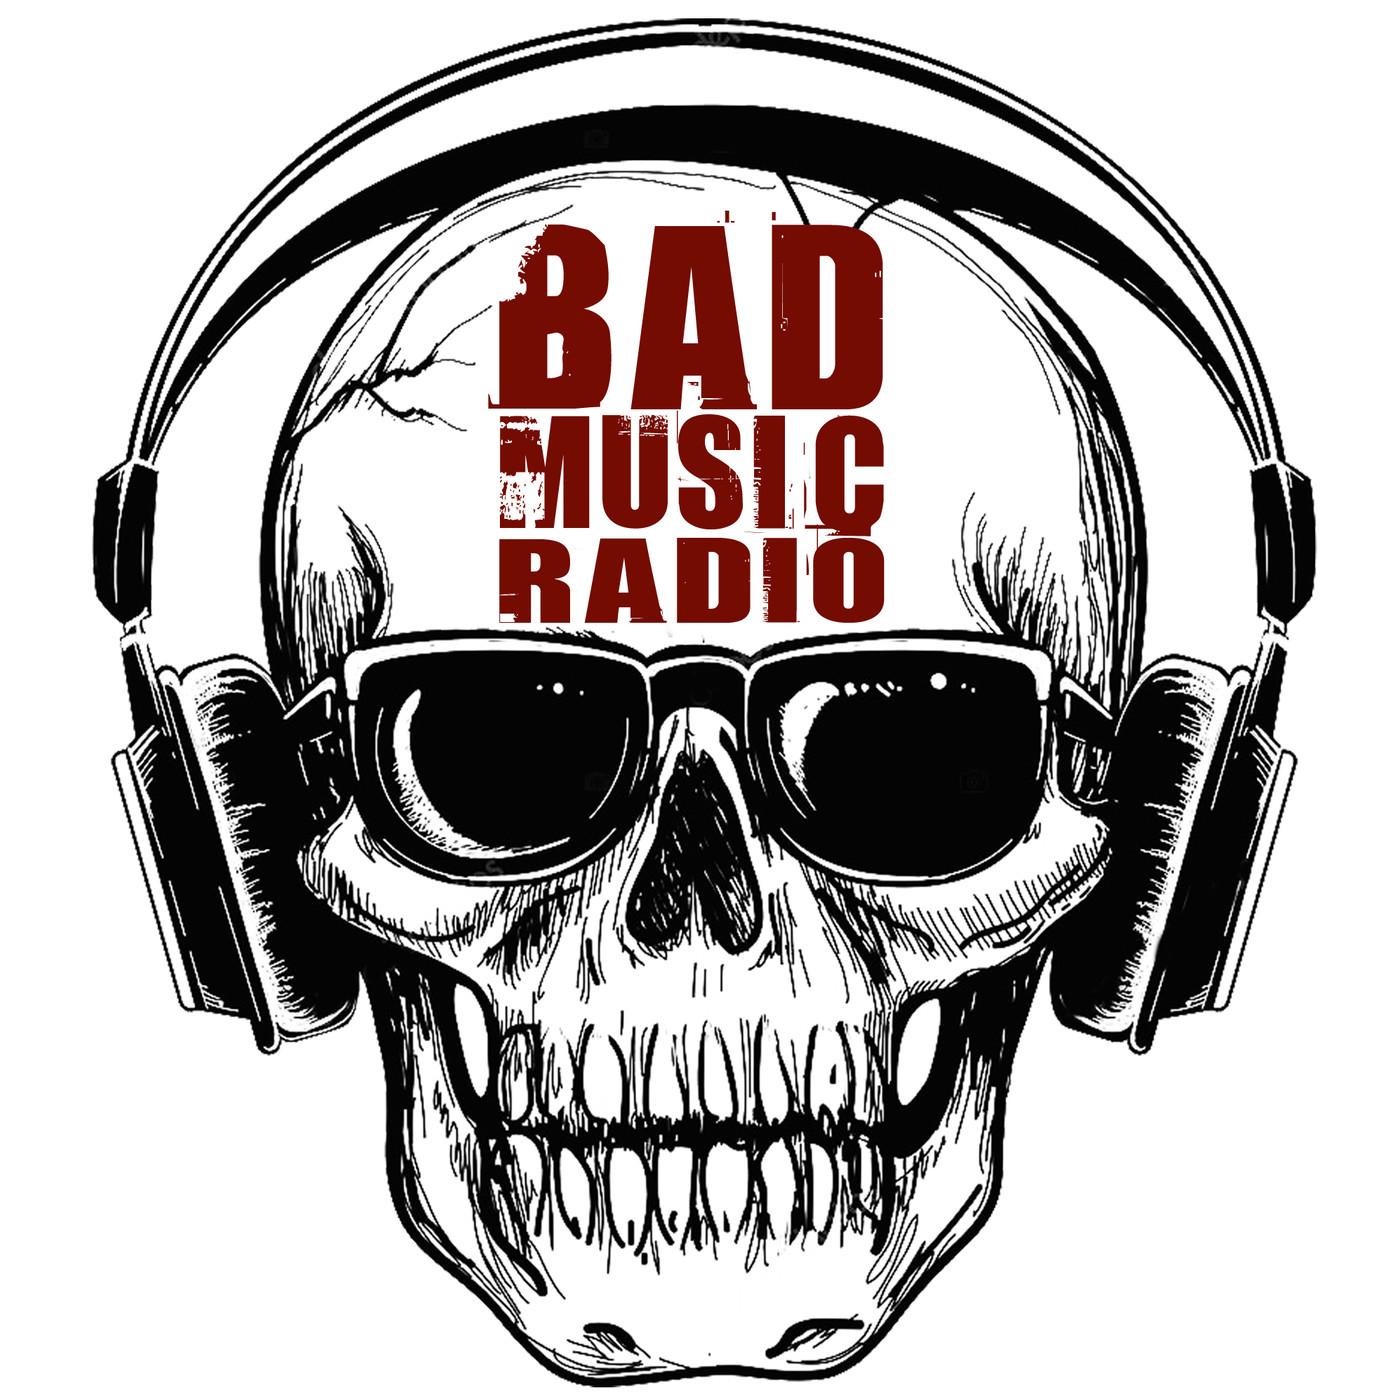 Escucha BAD MUSIC - iVoox